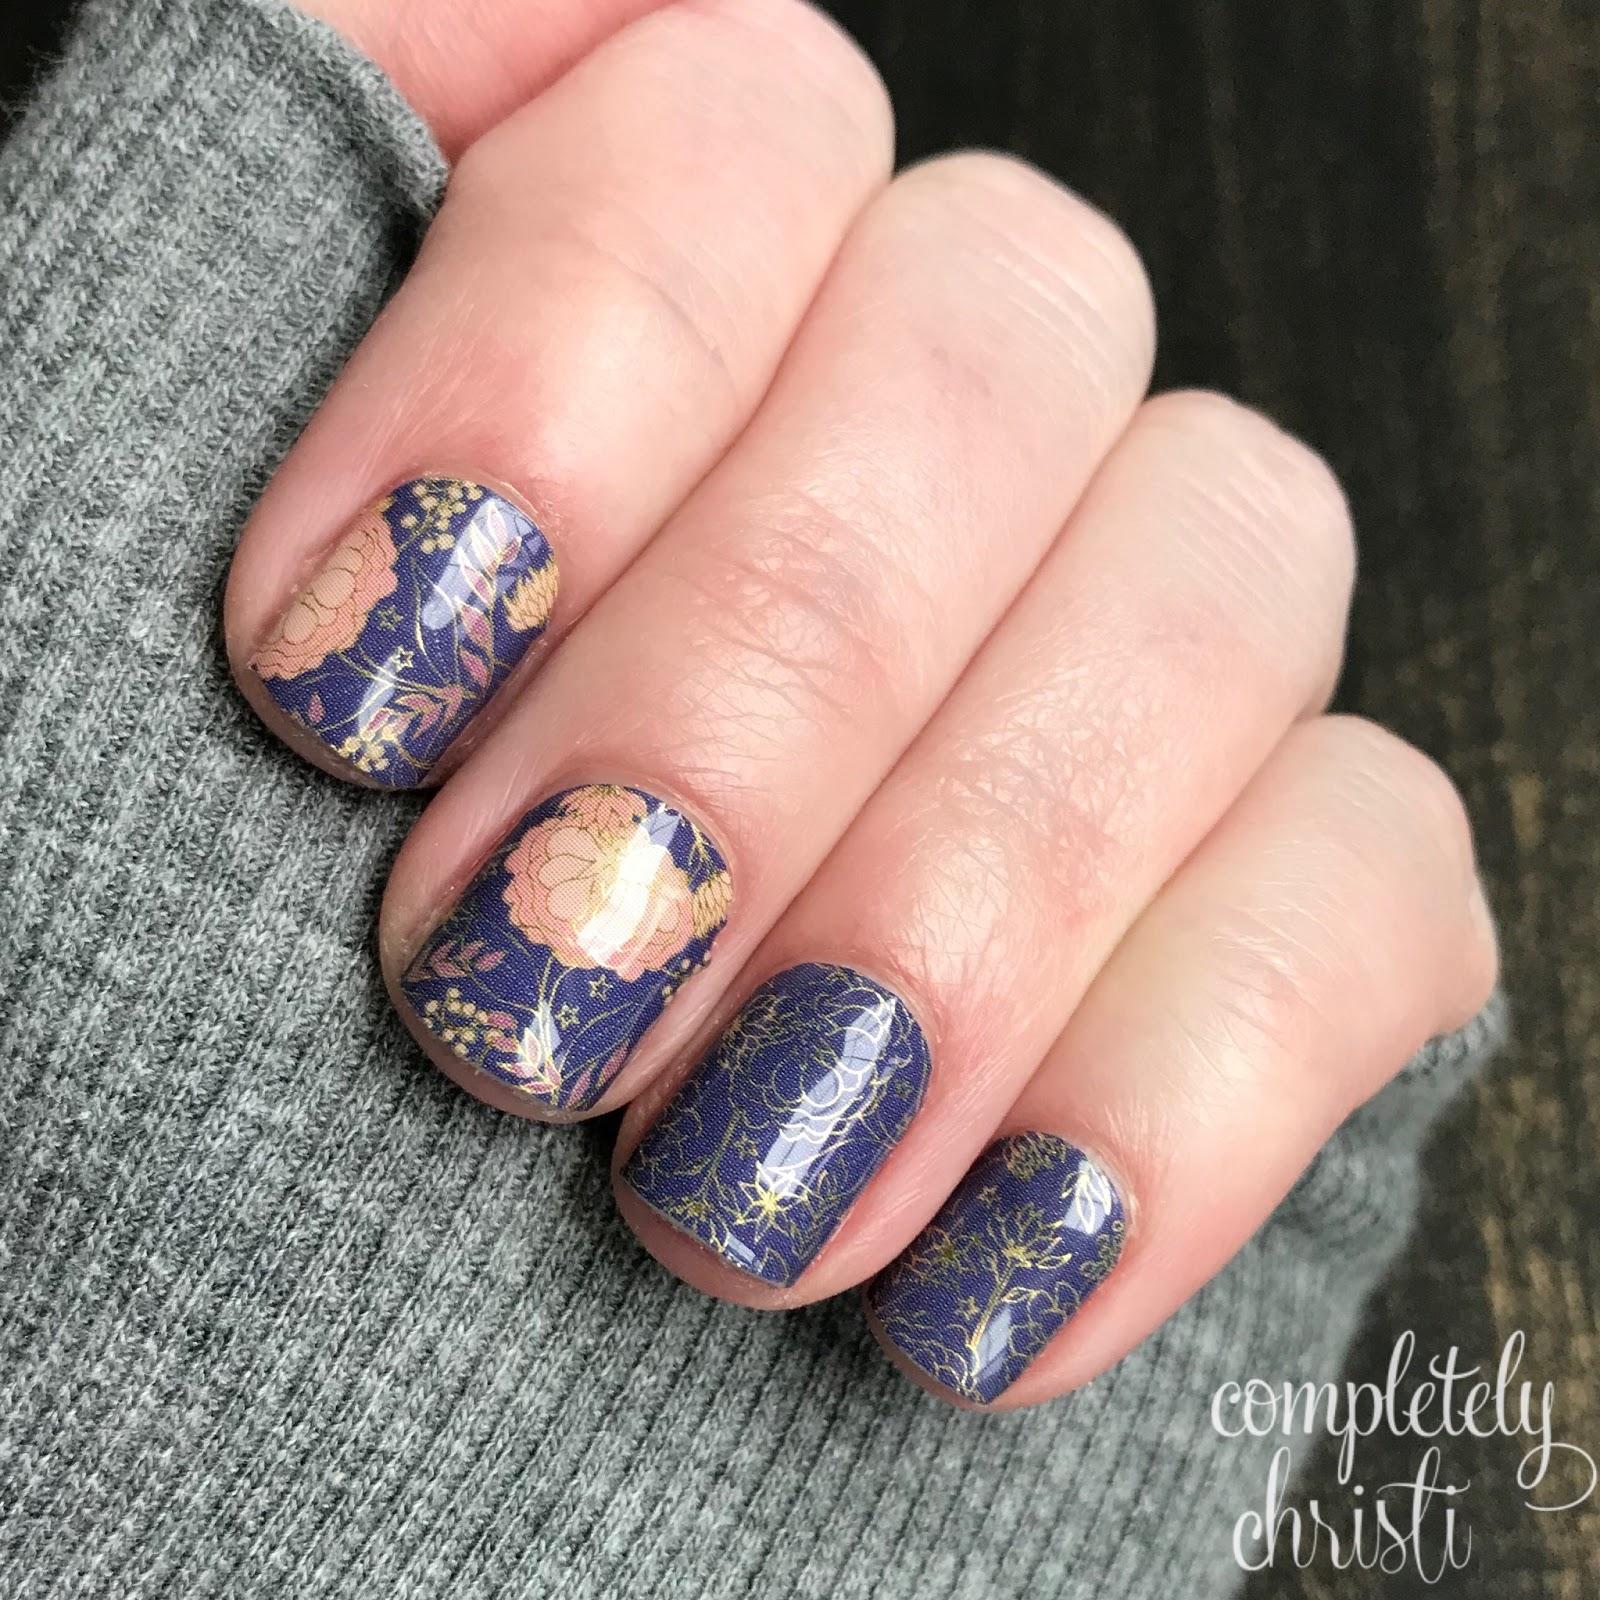 On Trend Beauty | Christi Fultz